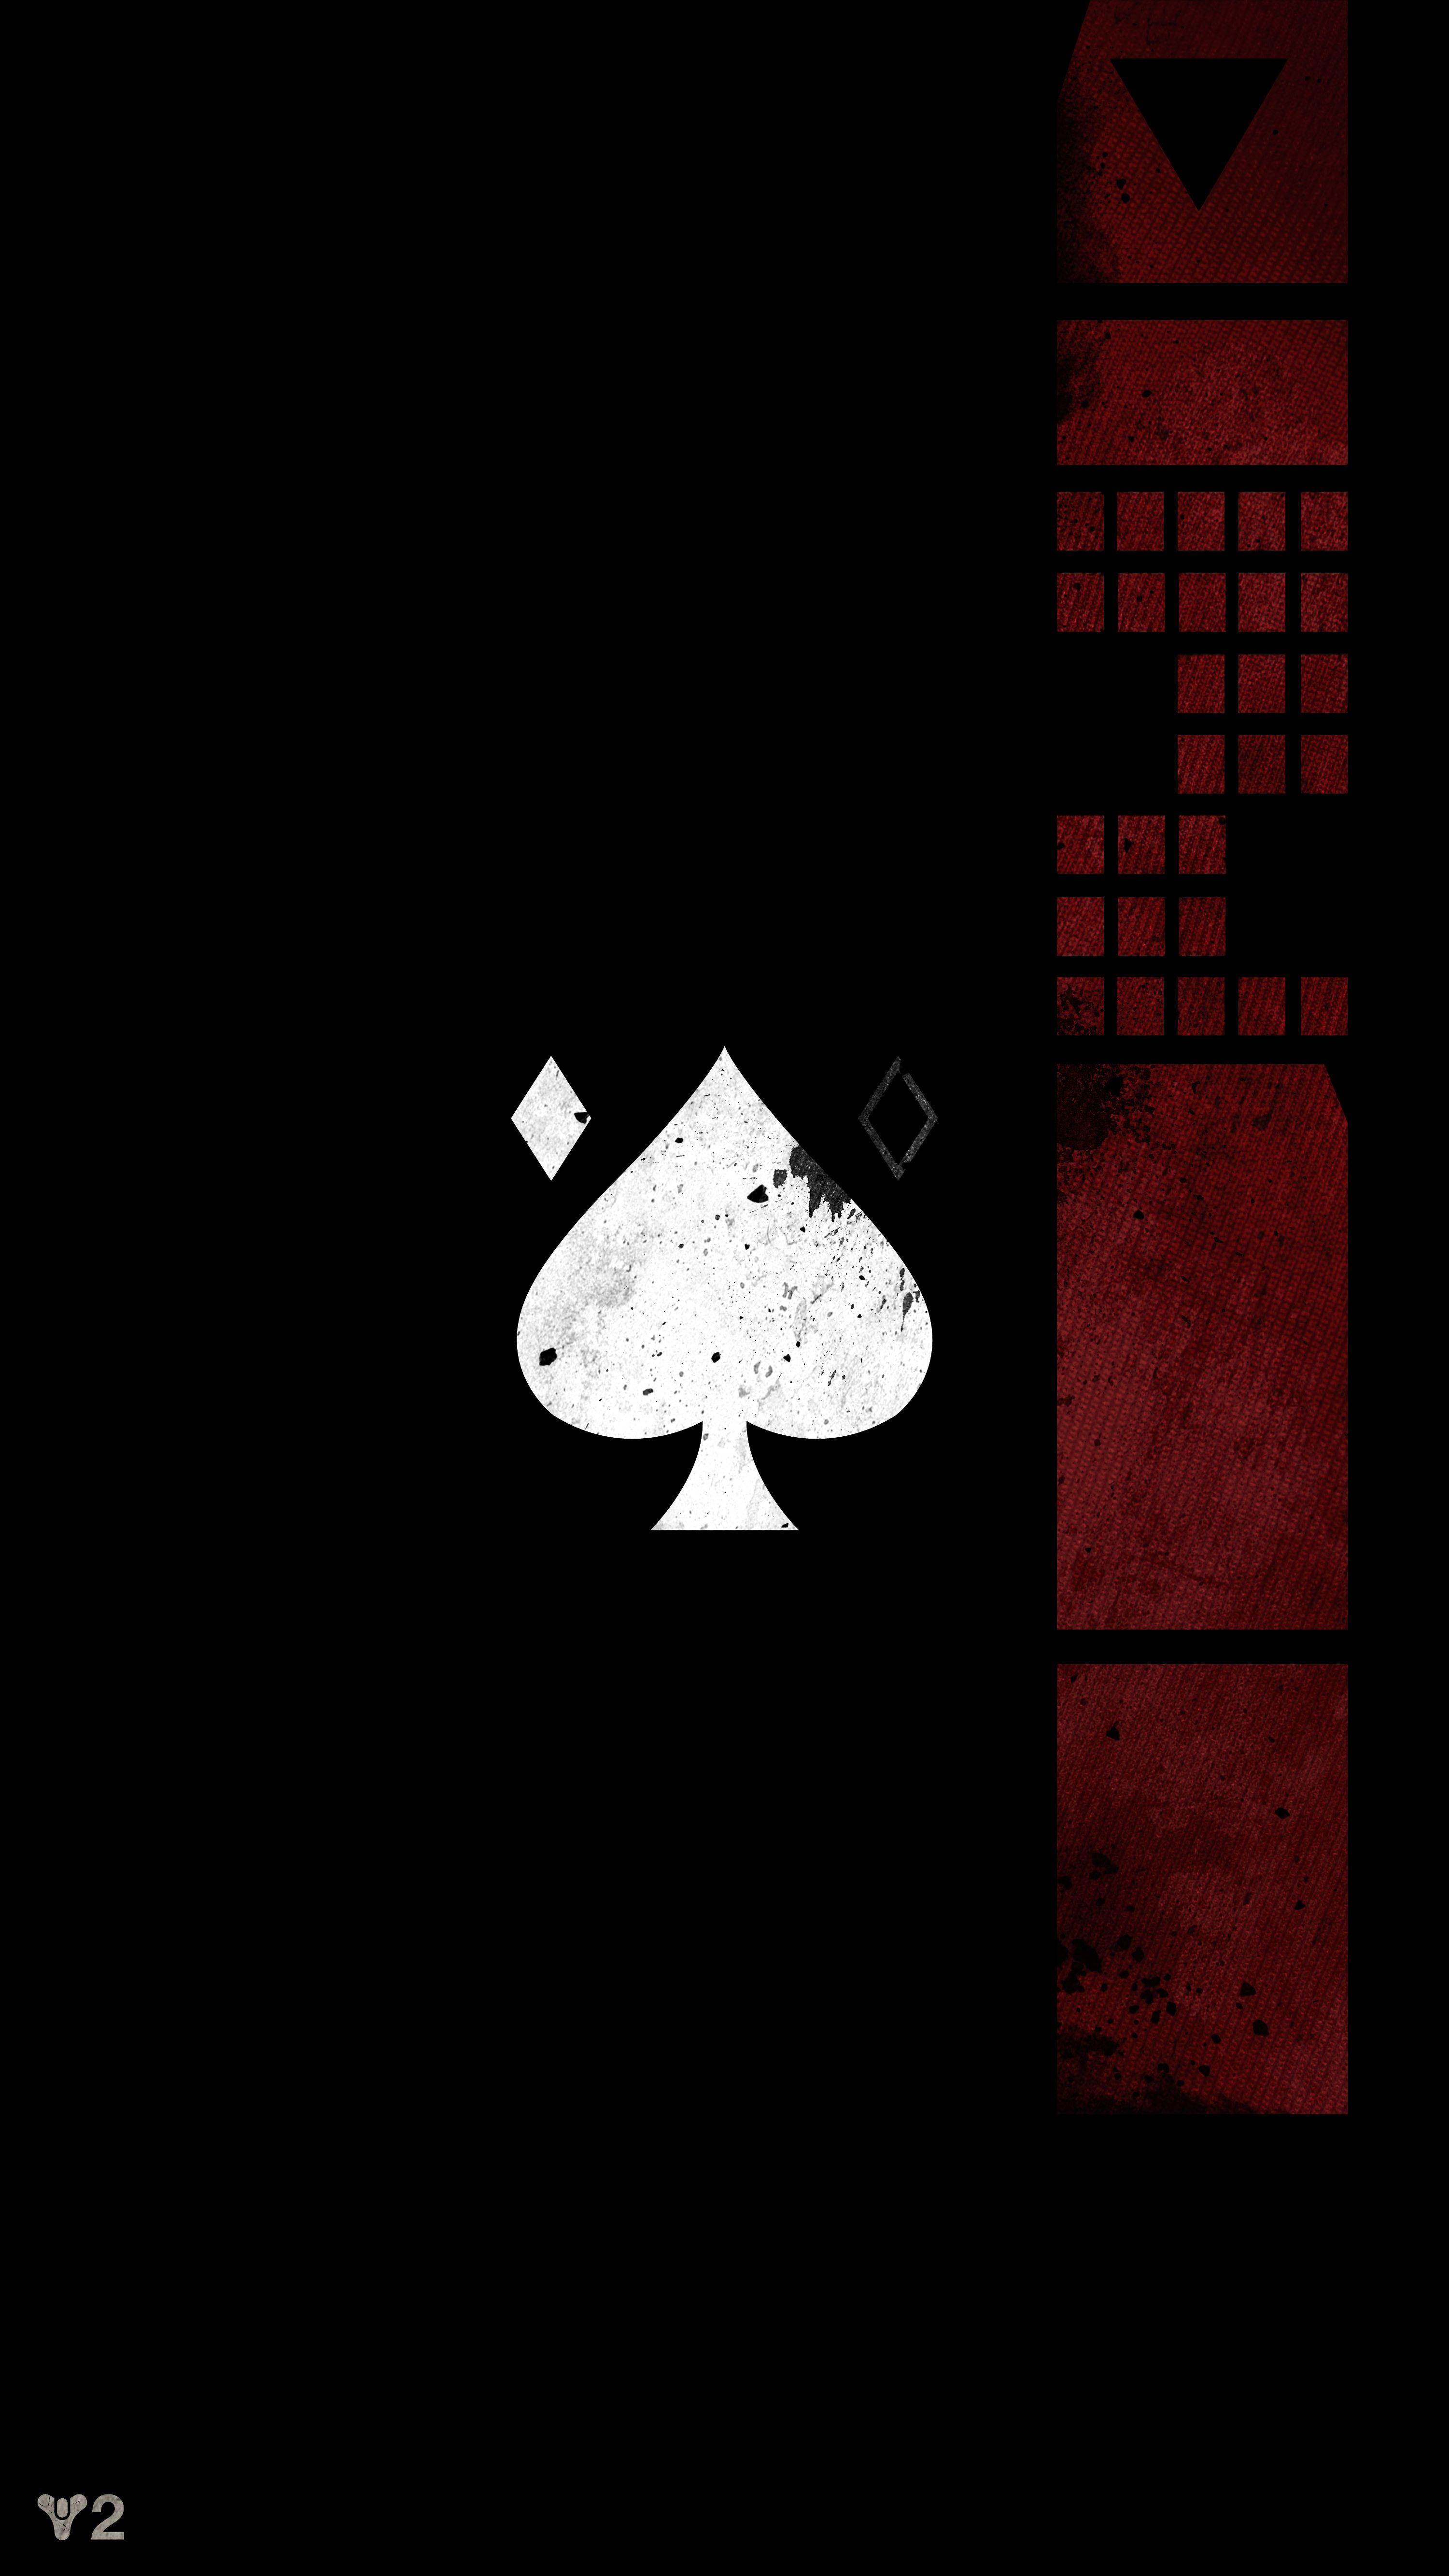 Ace Card Wallpaper : wallpaper, Spades, IPhone, Wallpapers, Wallpaper